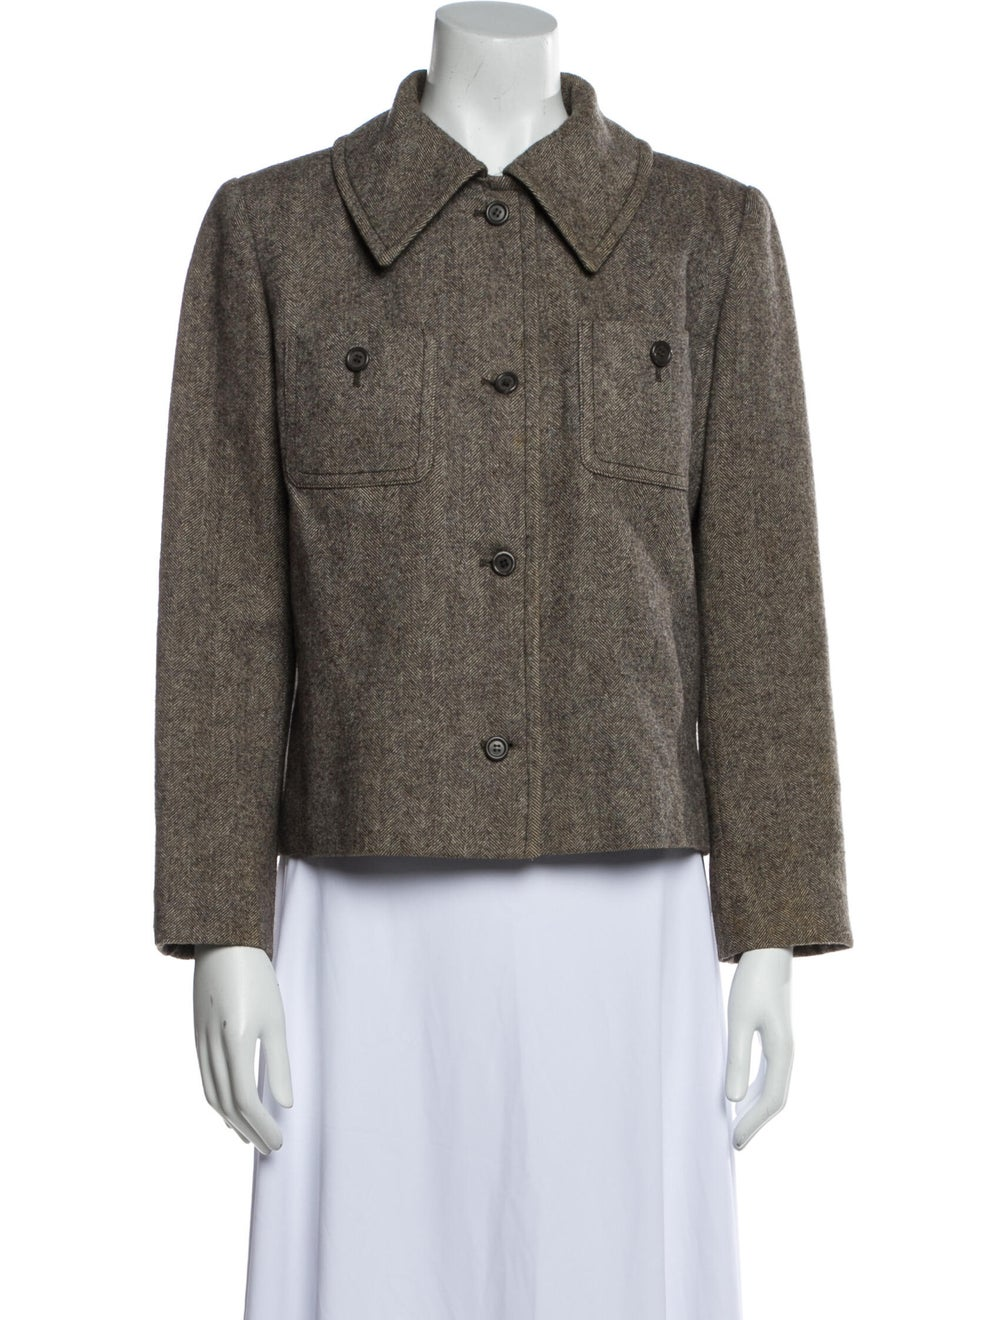 Christian Dior Vintage 1980's Blazer Brown - image 1